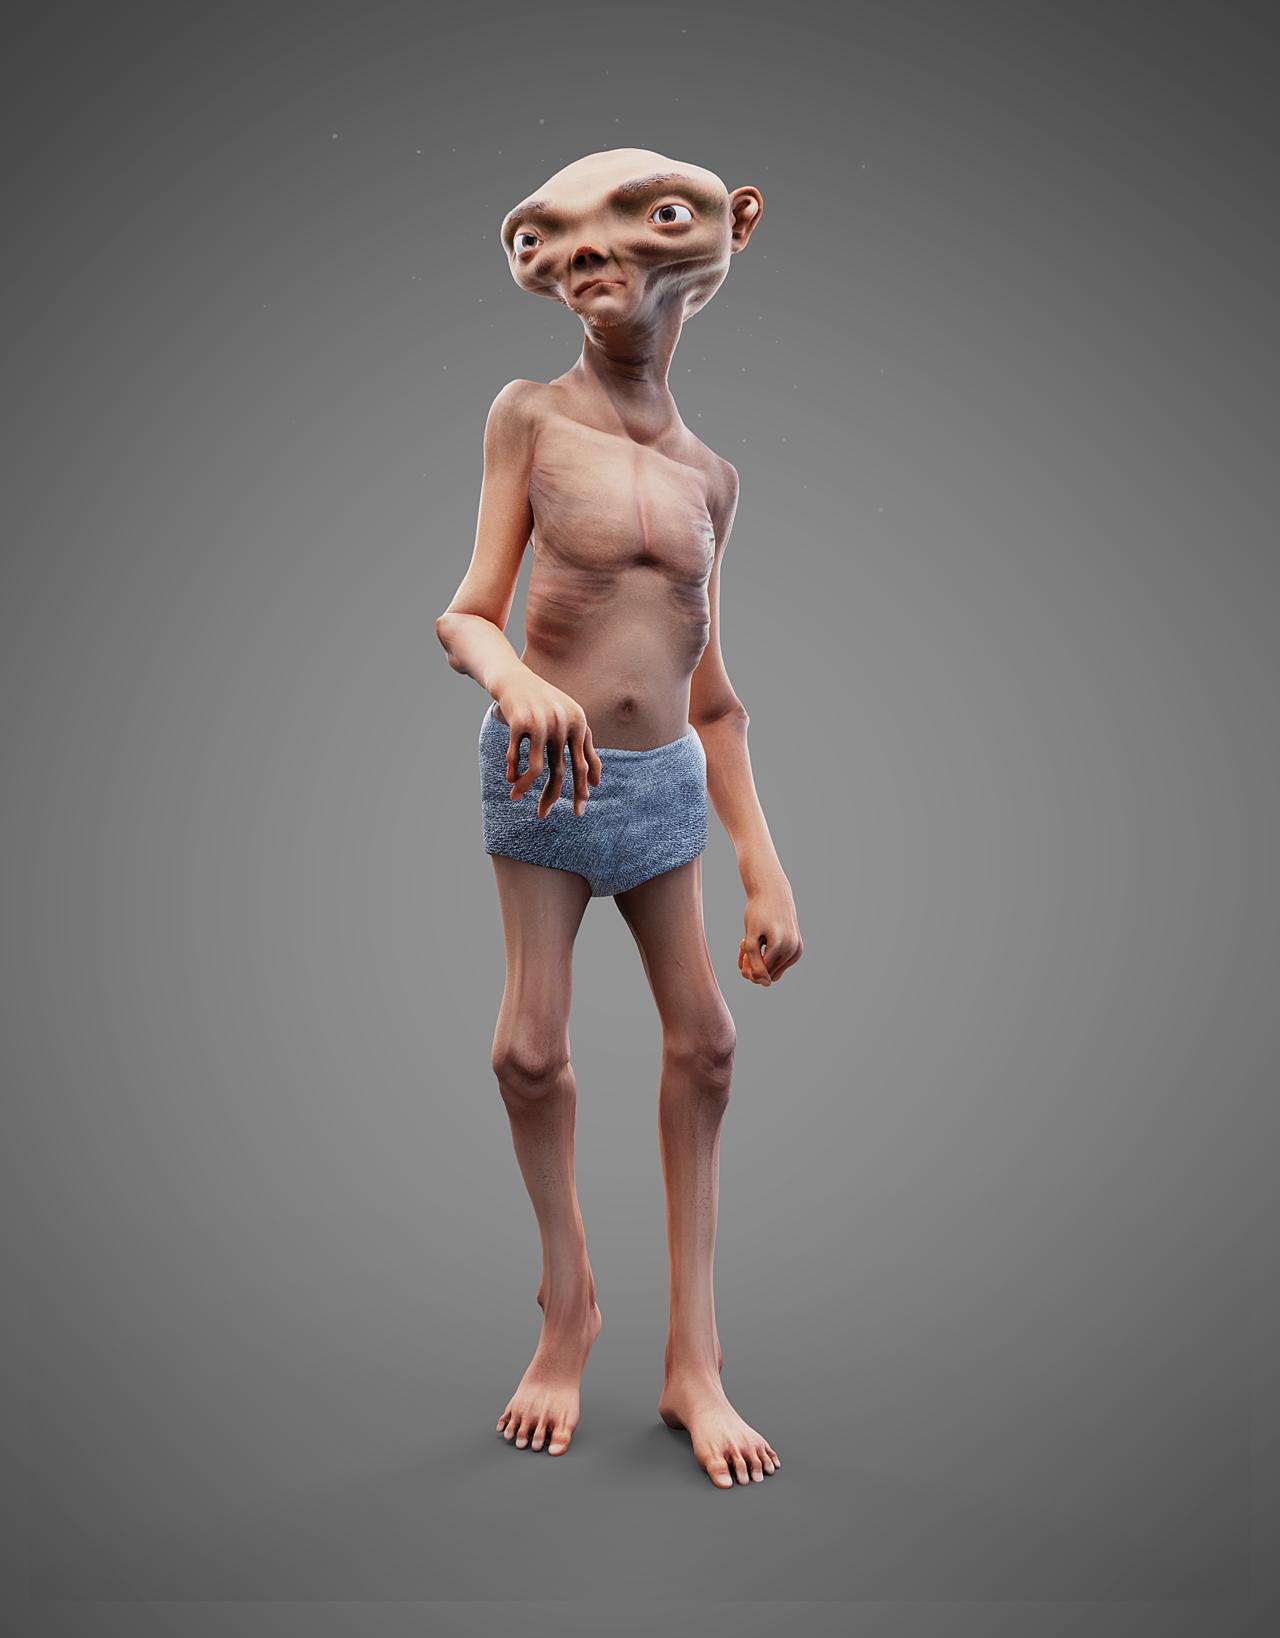 Humanoid creature